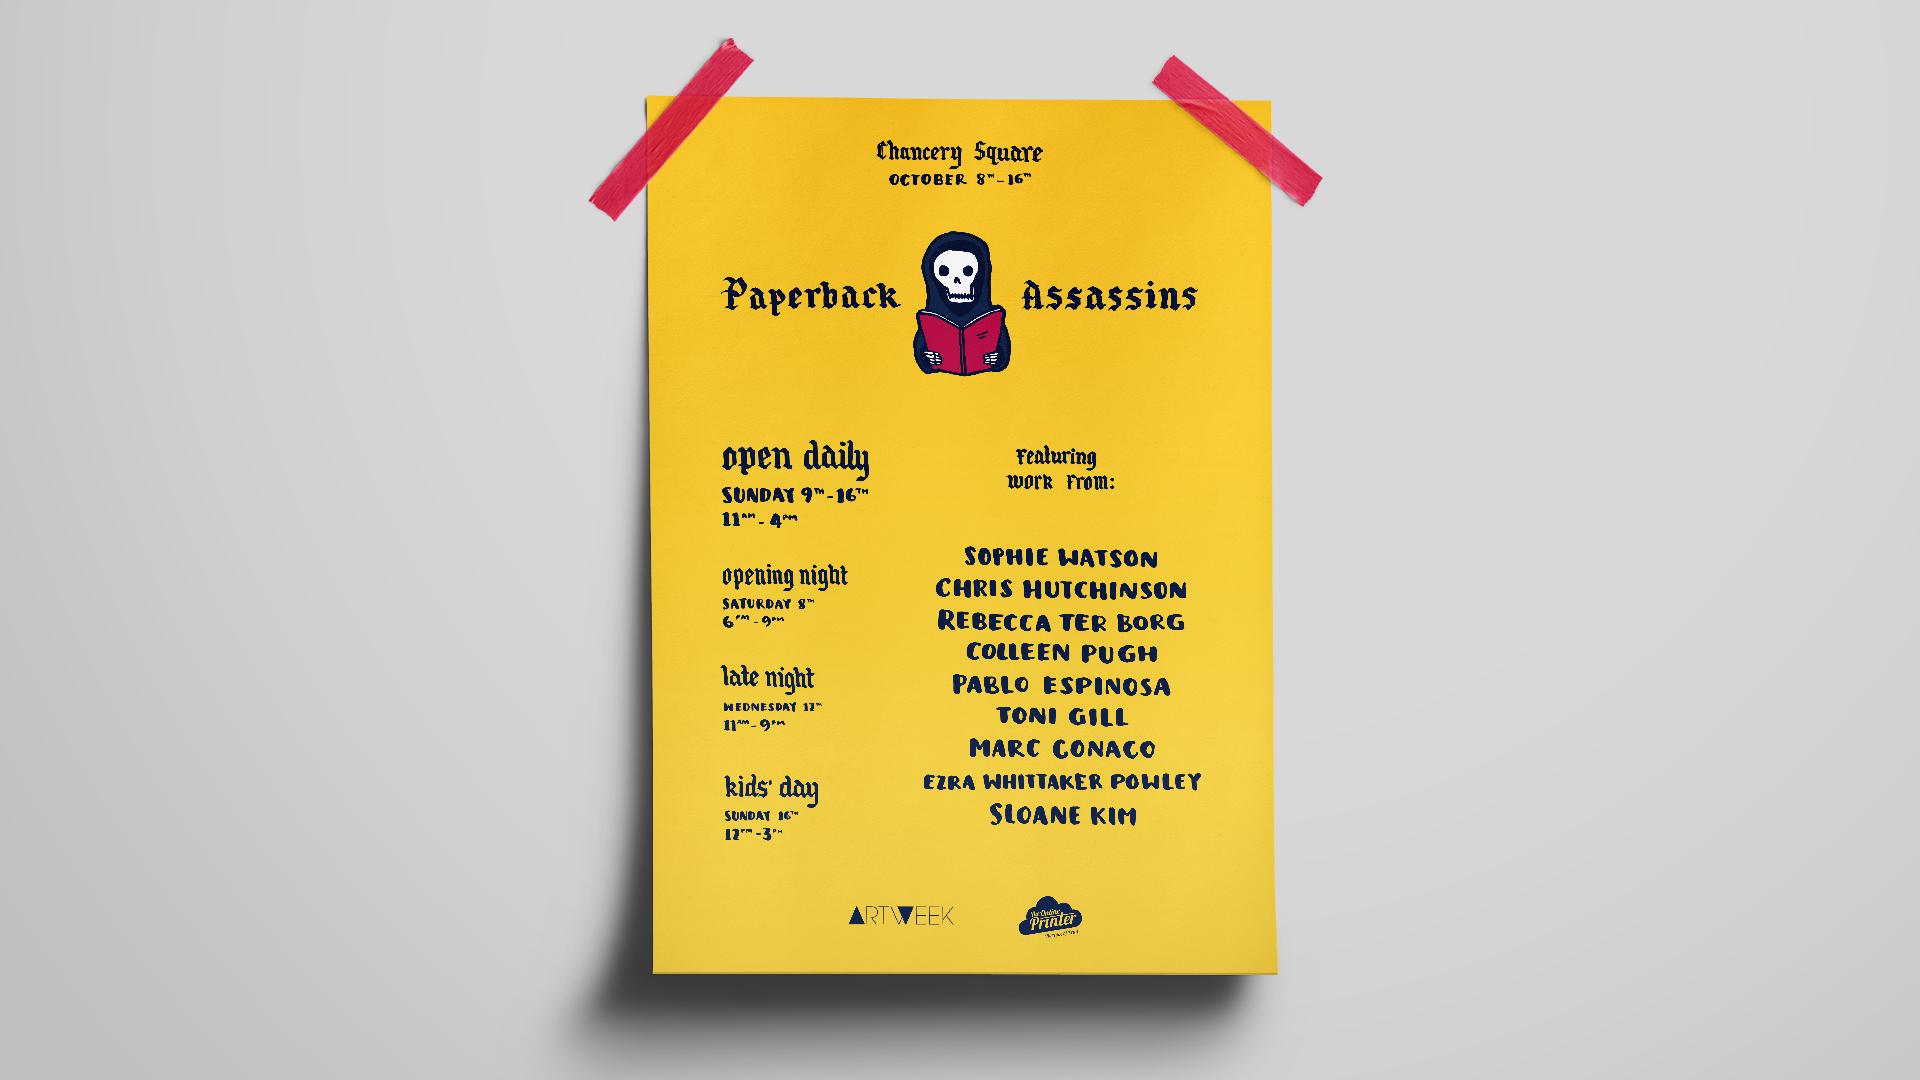 Paperback Assassins Poster.jpg